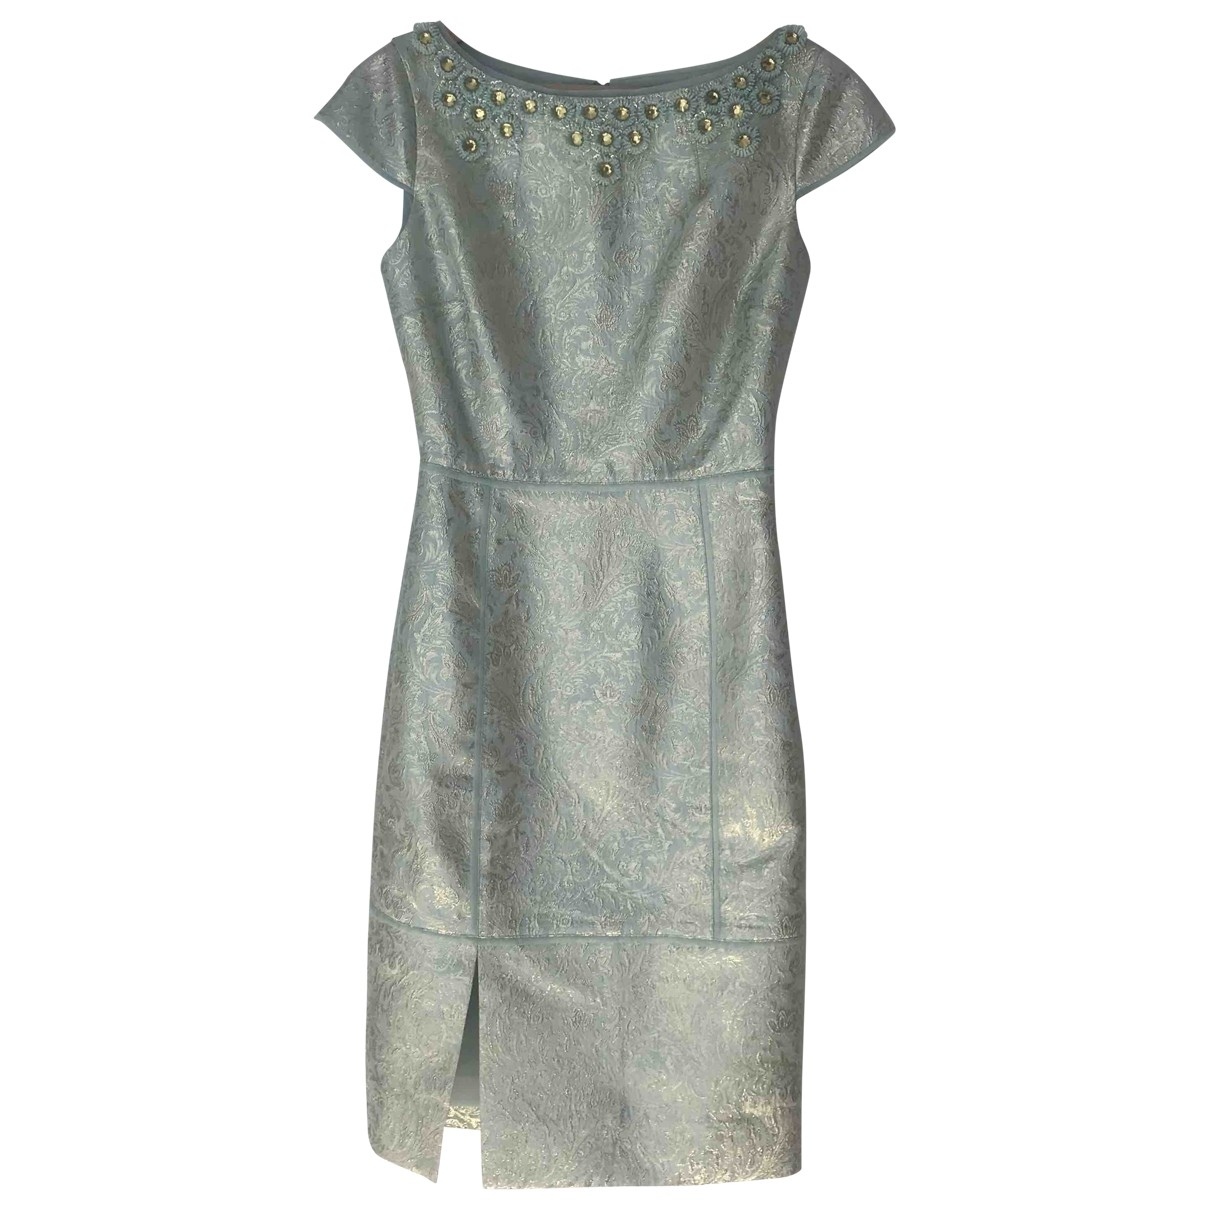 Tory Burch \N Gold Cotton dress for Women XS International